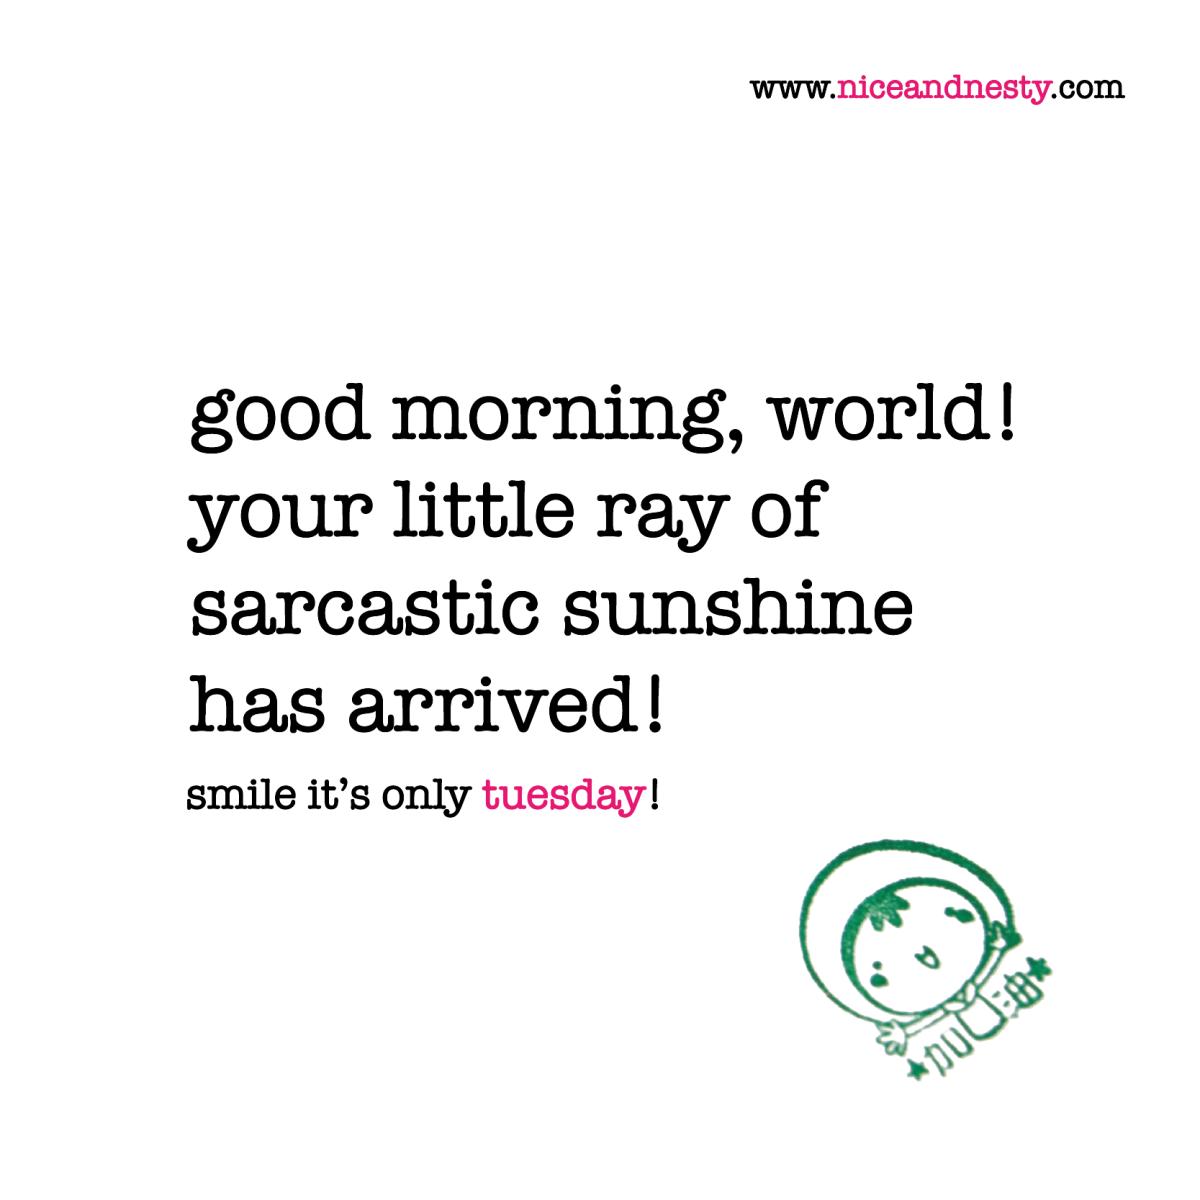 Good Morning Sunshine Words : Good morning world your little ray of sarcastic sunshine